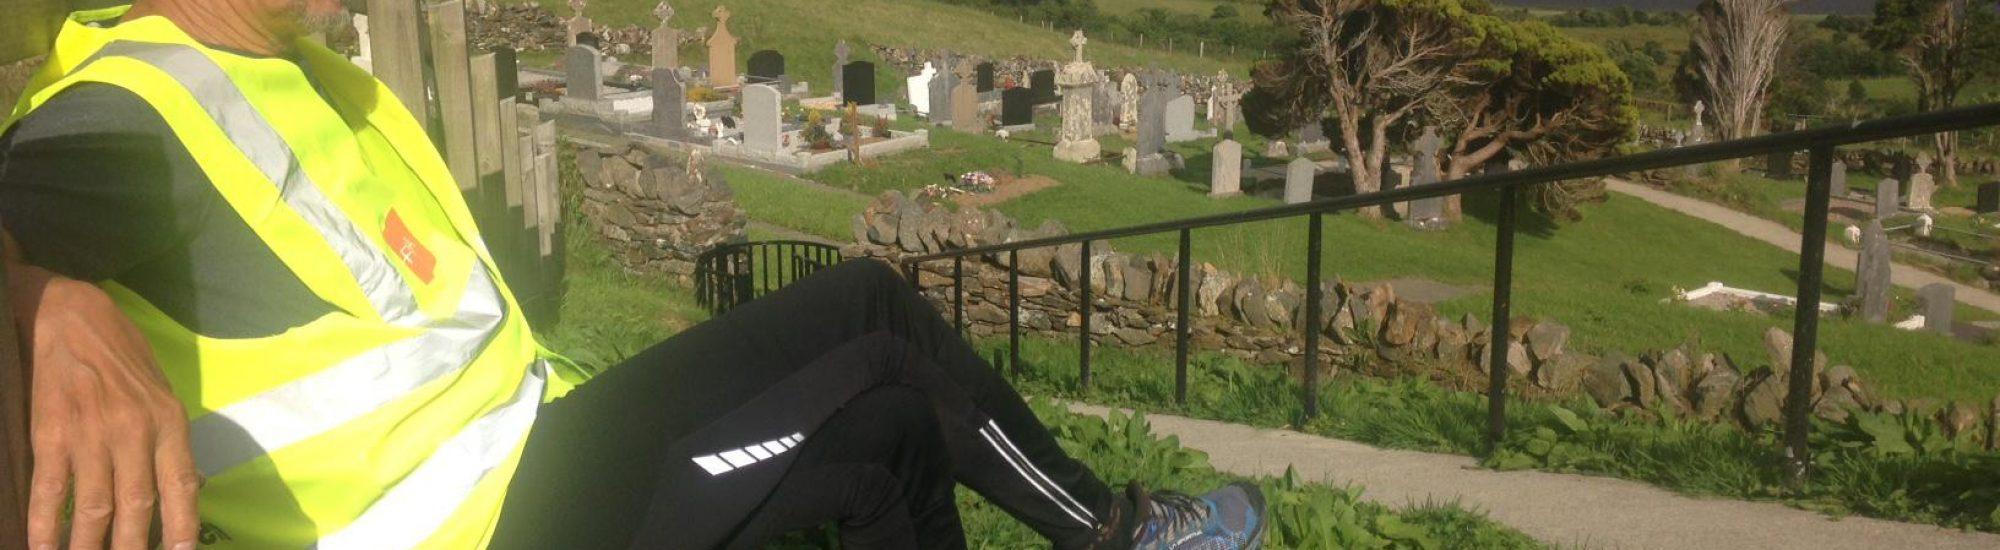 Cycling near Gartan in Donegal, Ireland